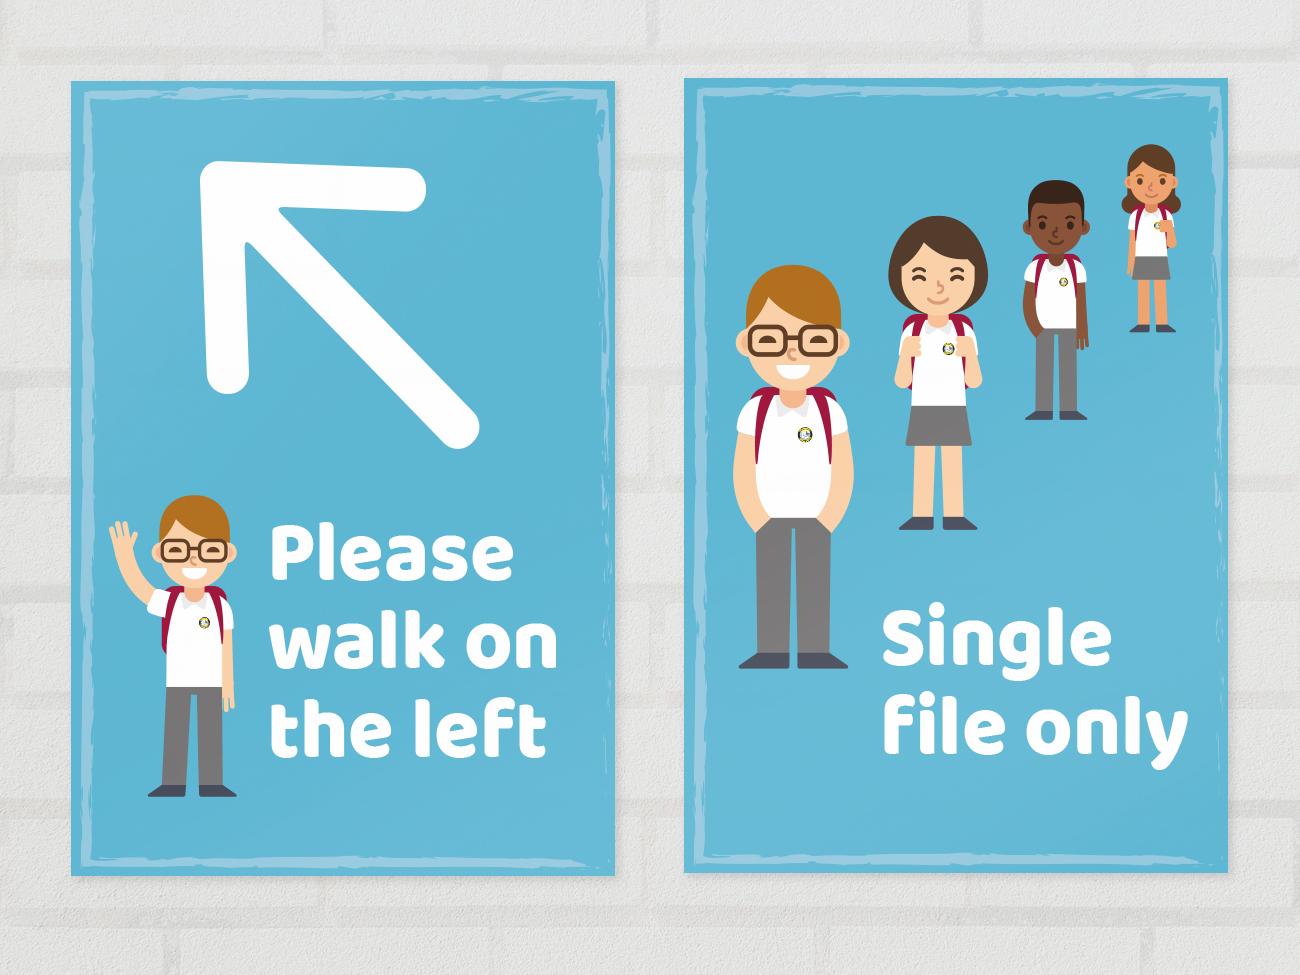 School social distancing posters